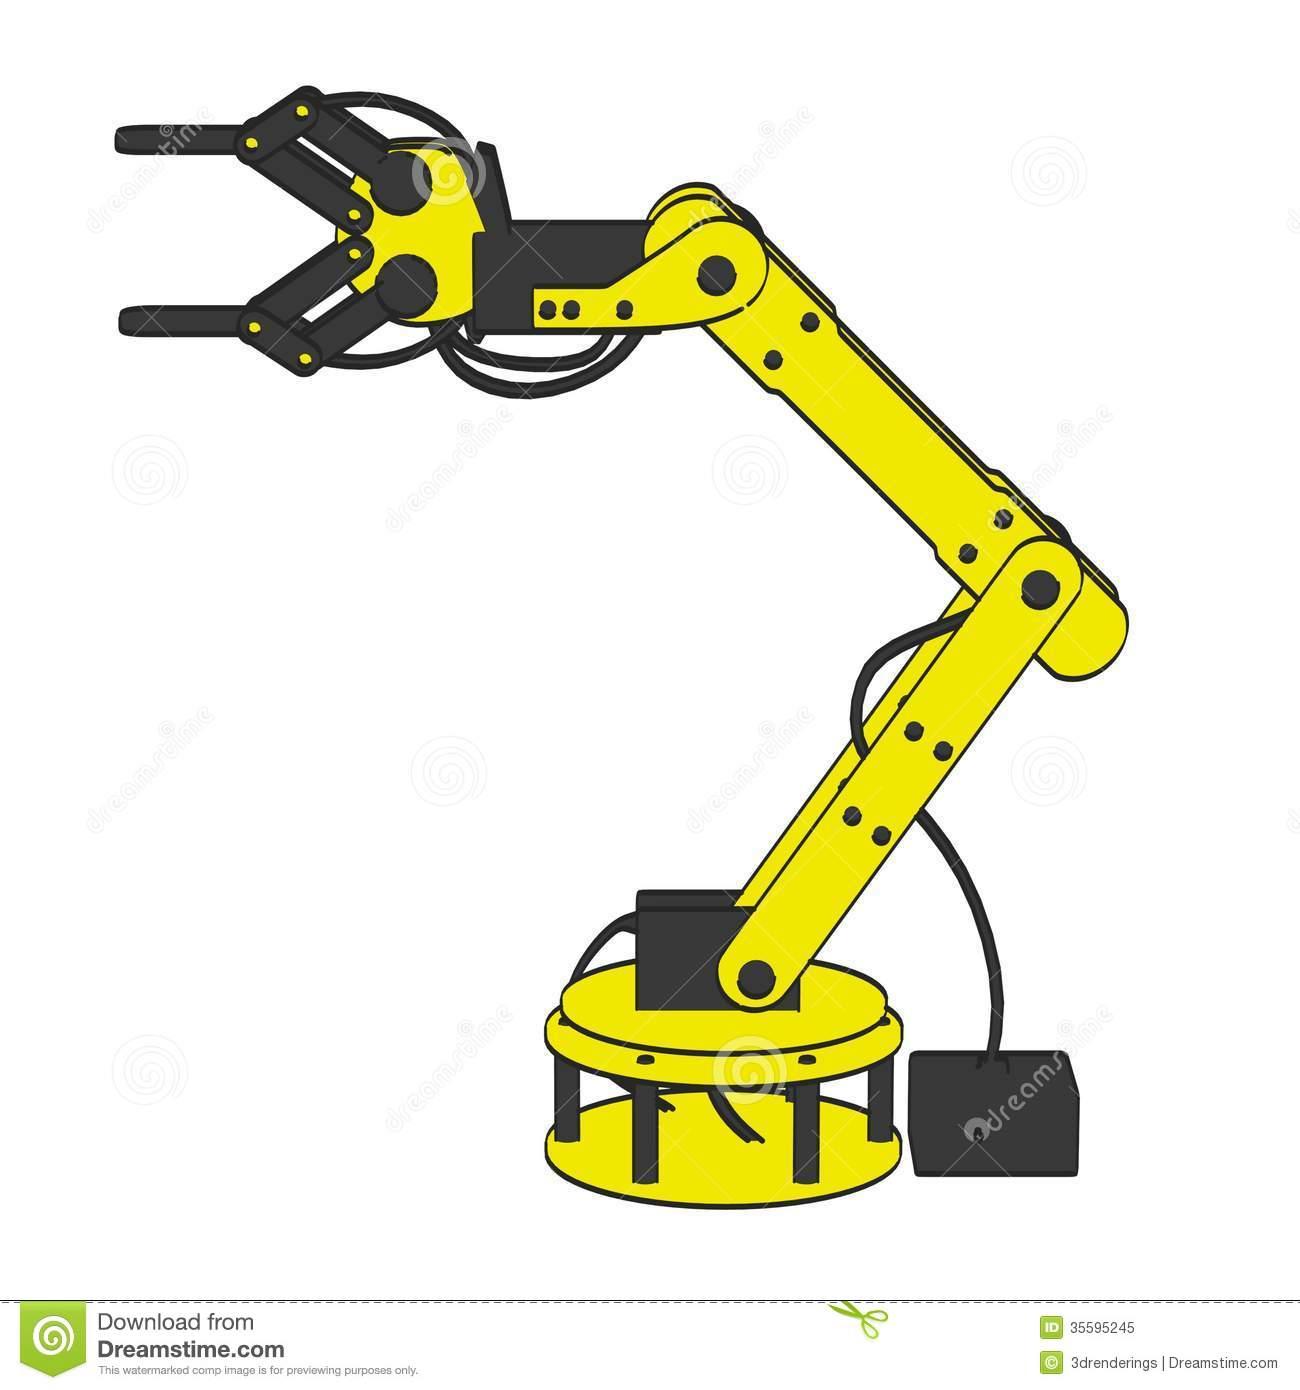 Robot arm clipart.